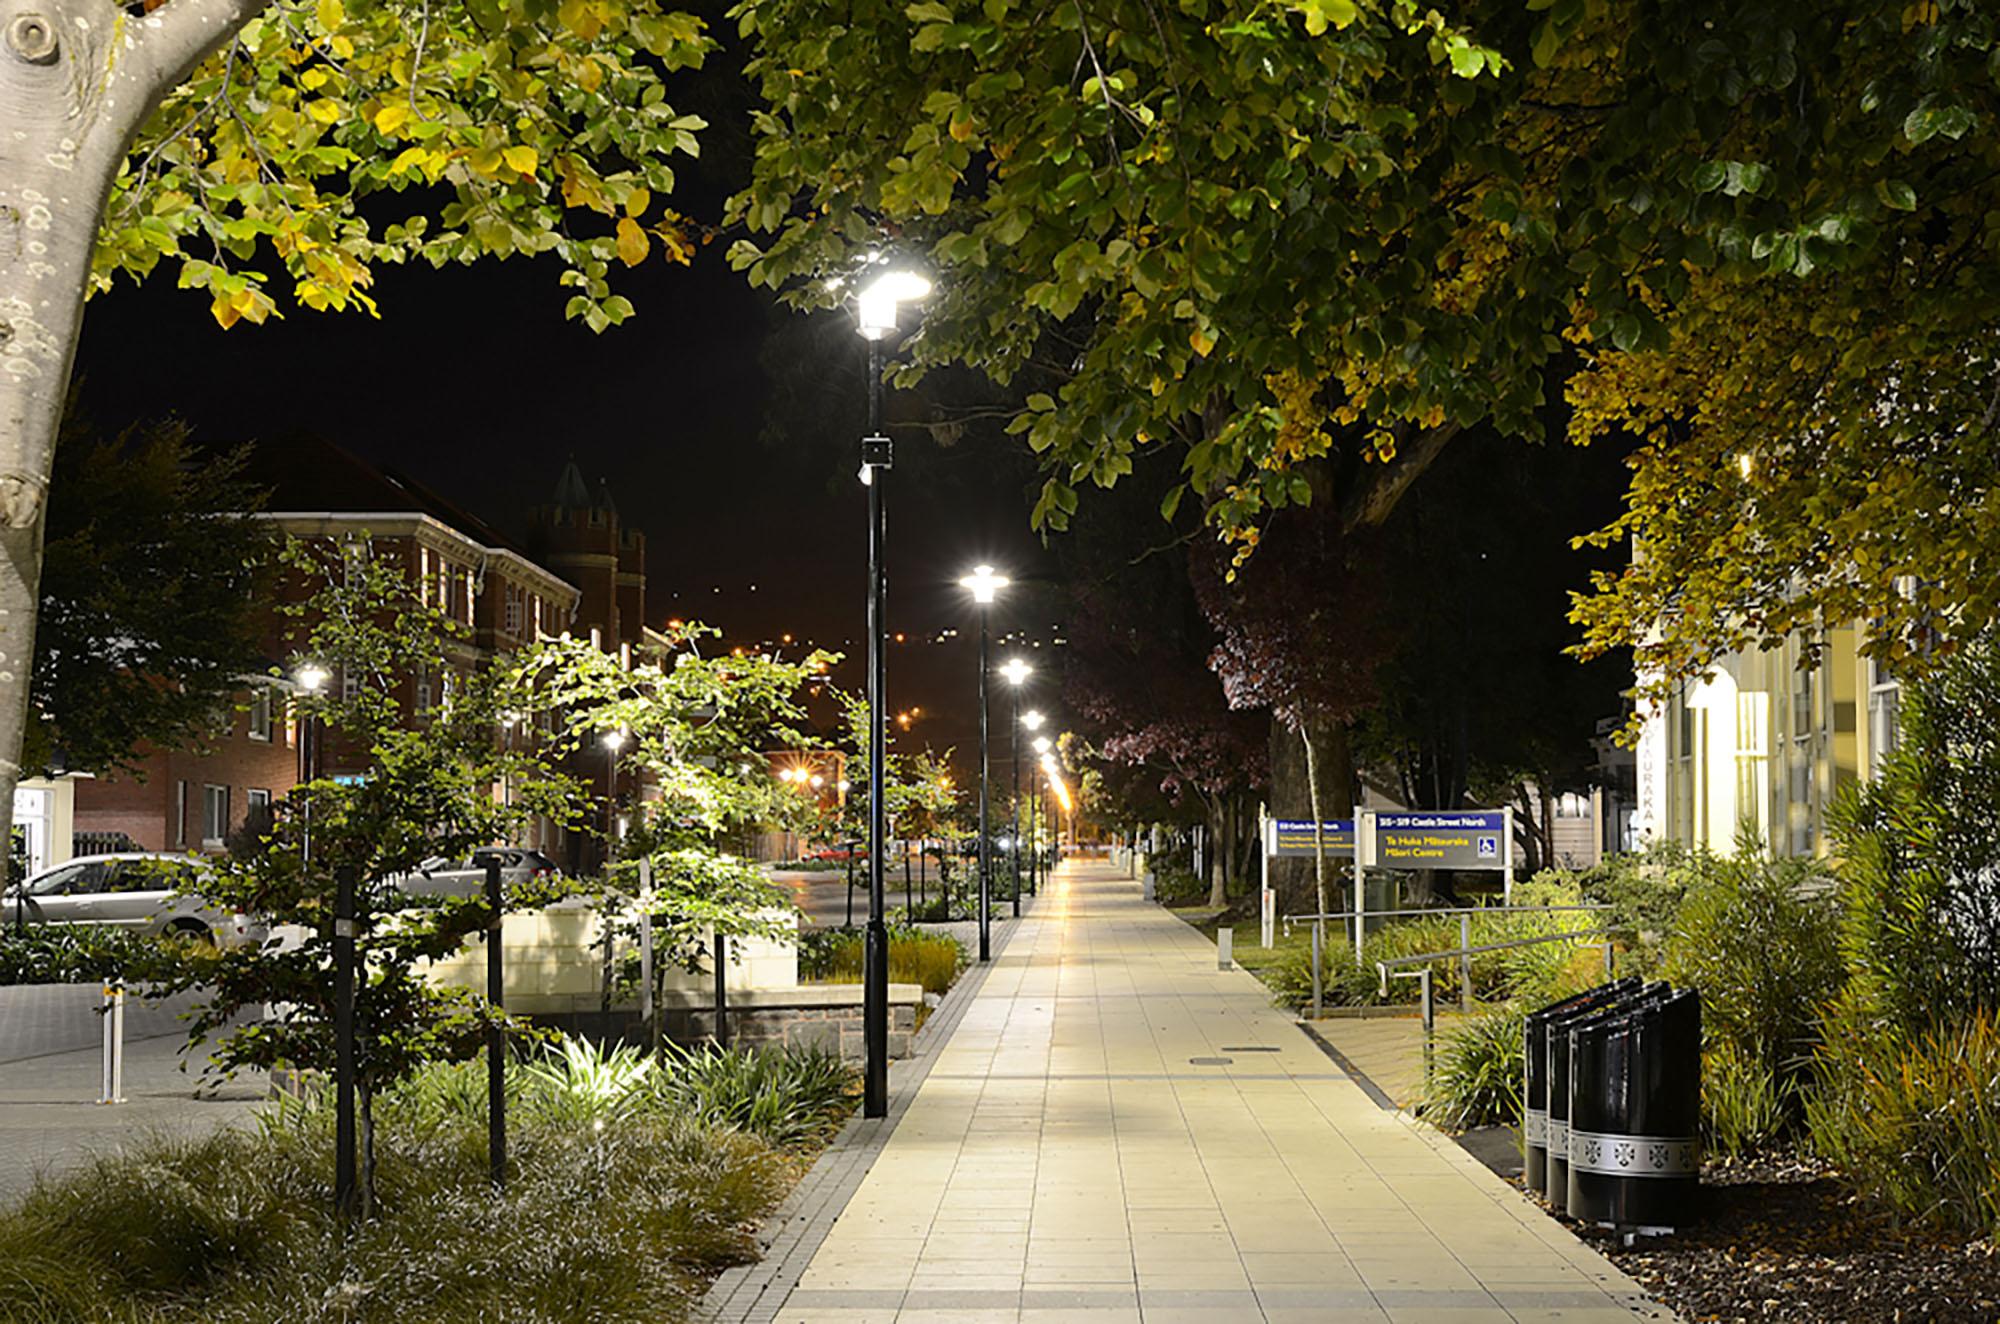 UoO_Castle St footpath night.jpg